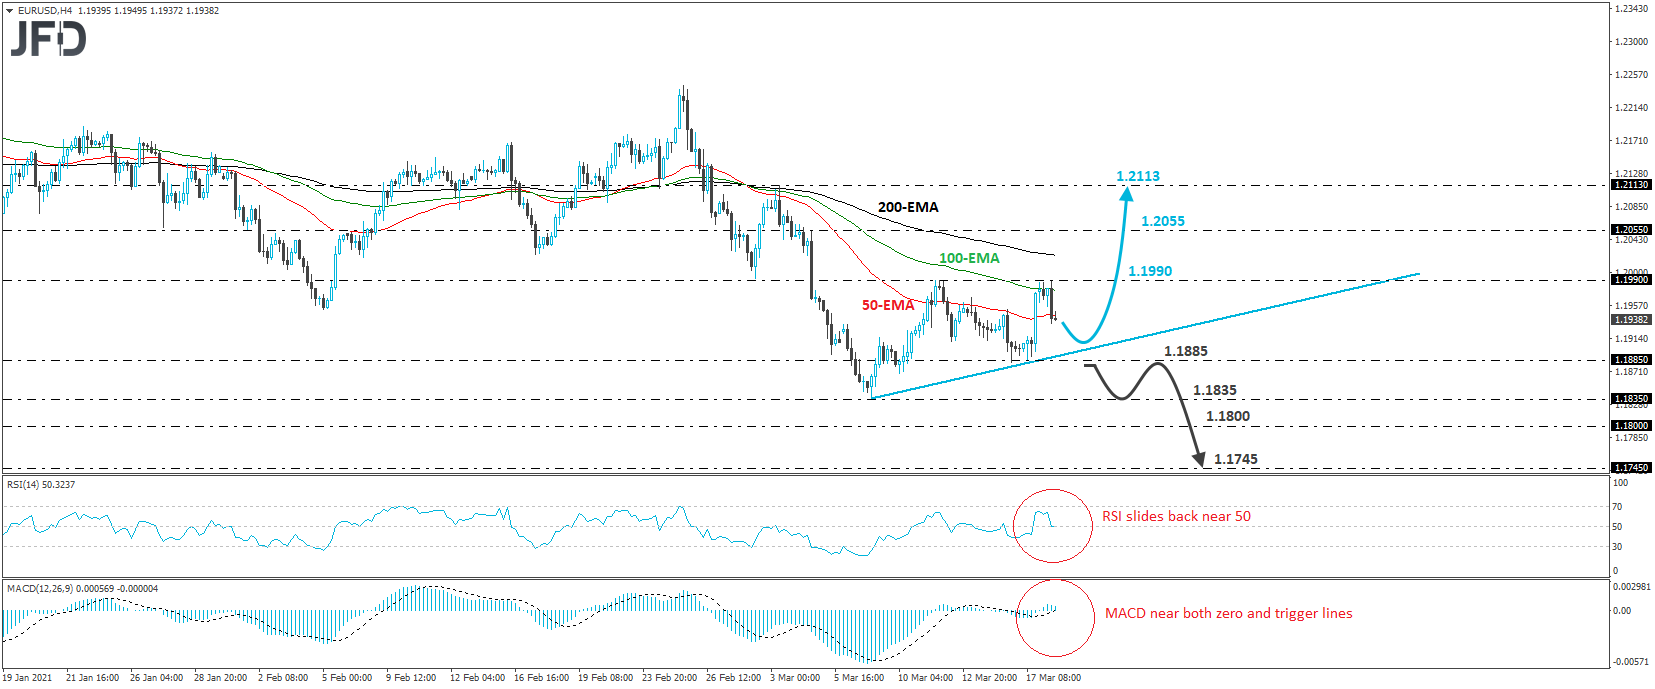 Will EUR/USD Rebound Soon? | Investing.com